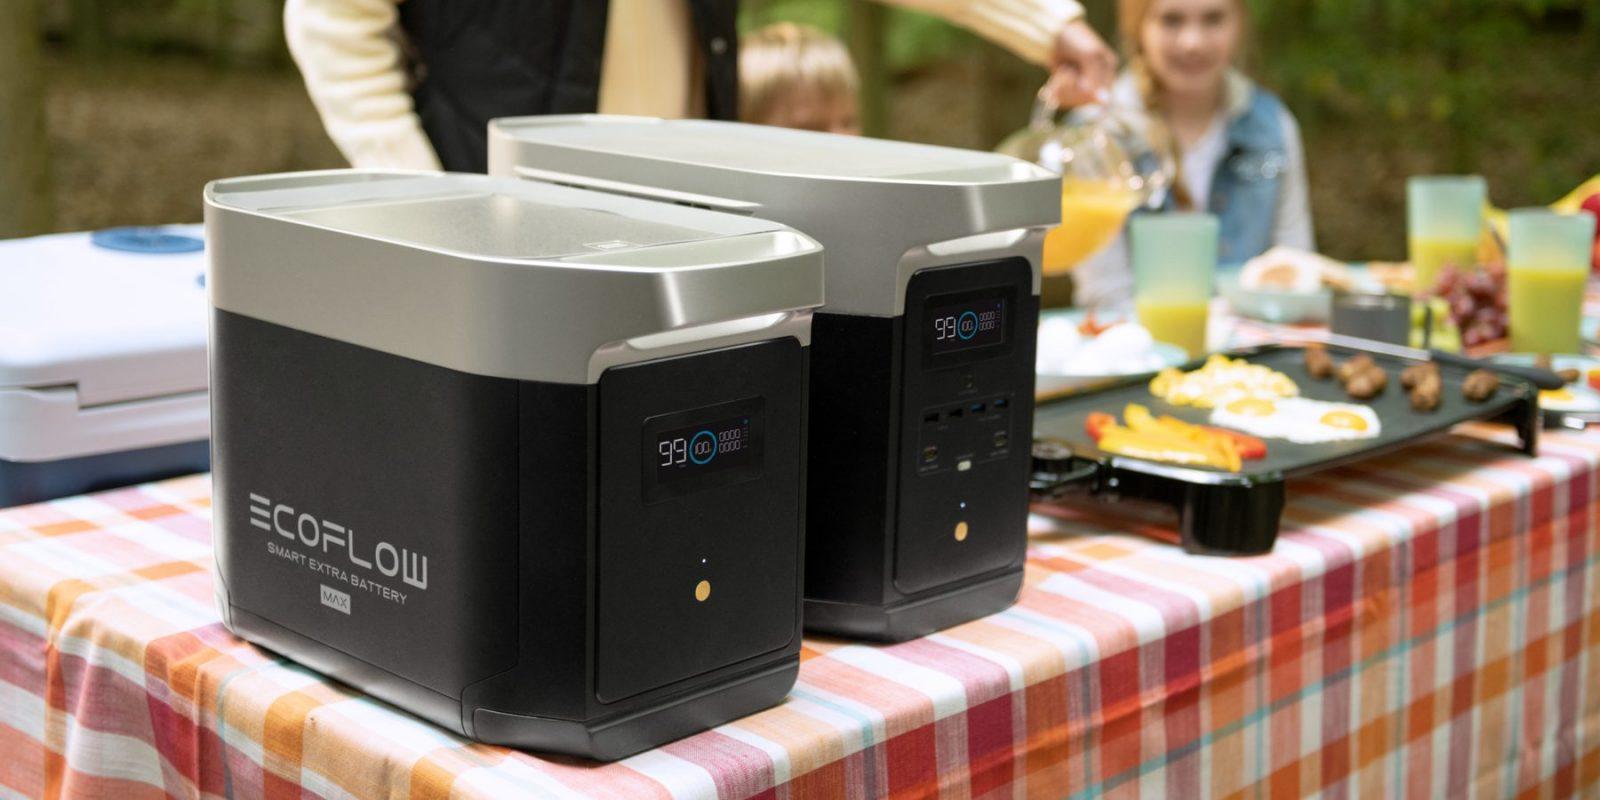 EcoFlow Delta Max Expandable Home Backup Power